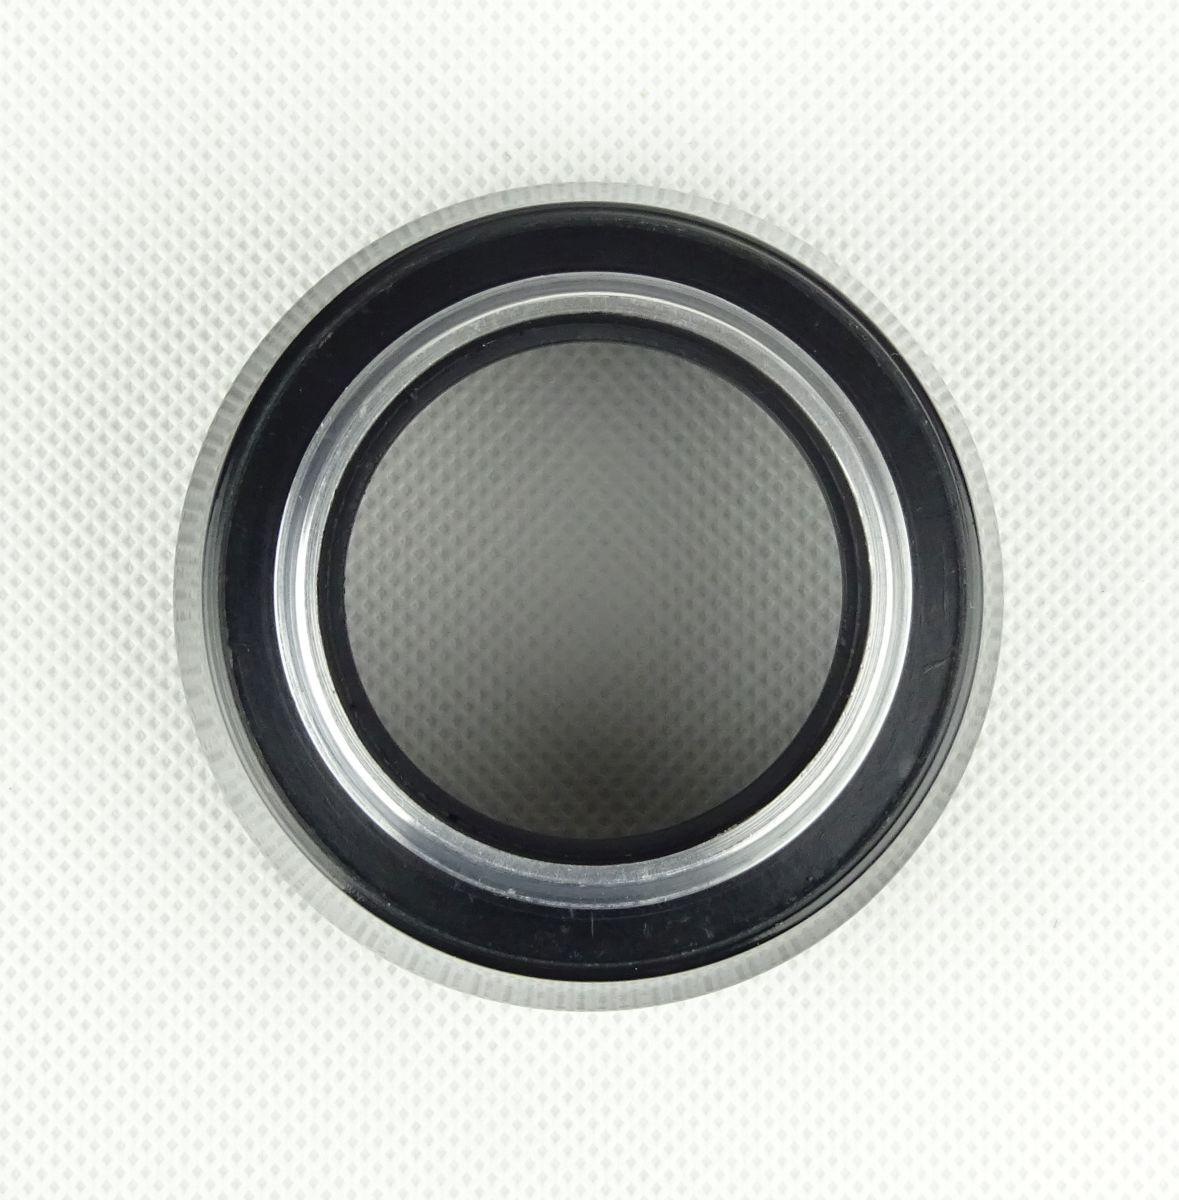 DSC00885.JPG (1179×1200)